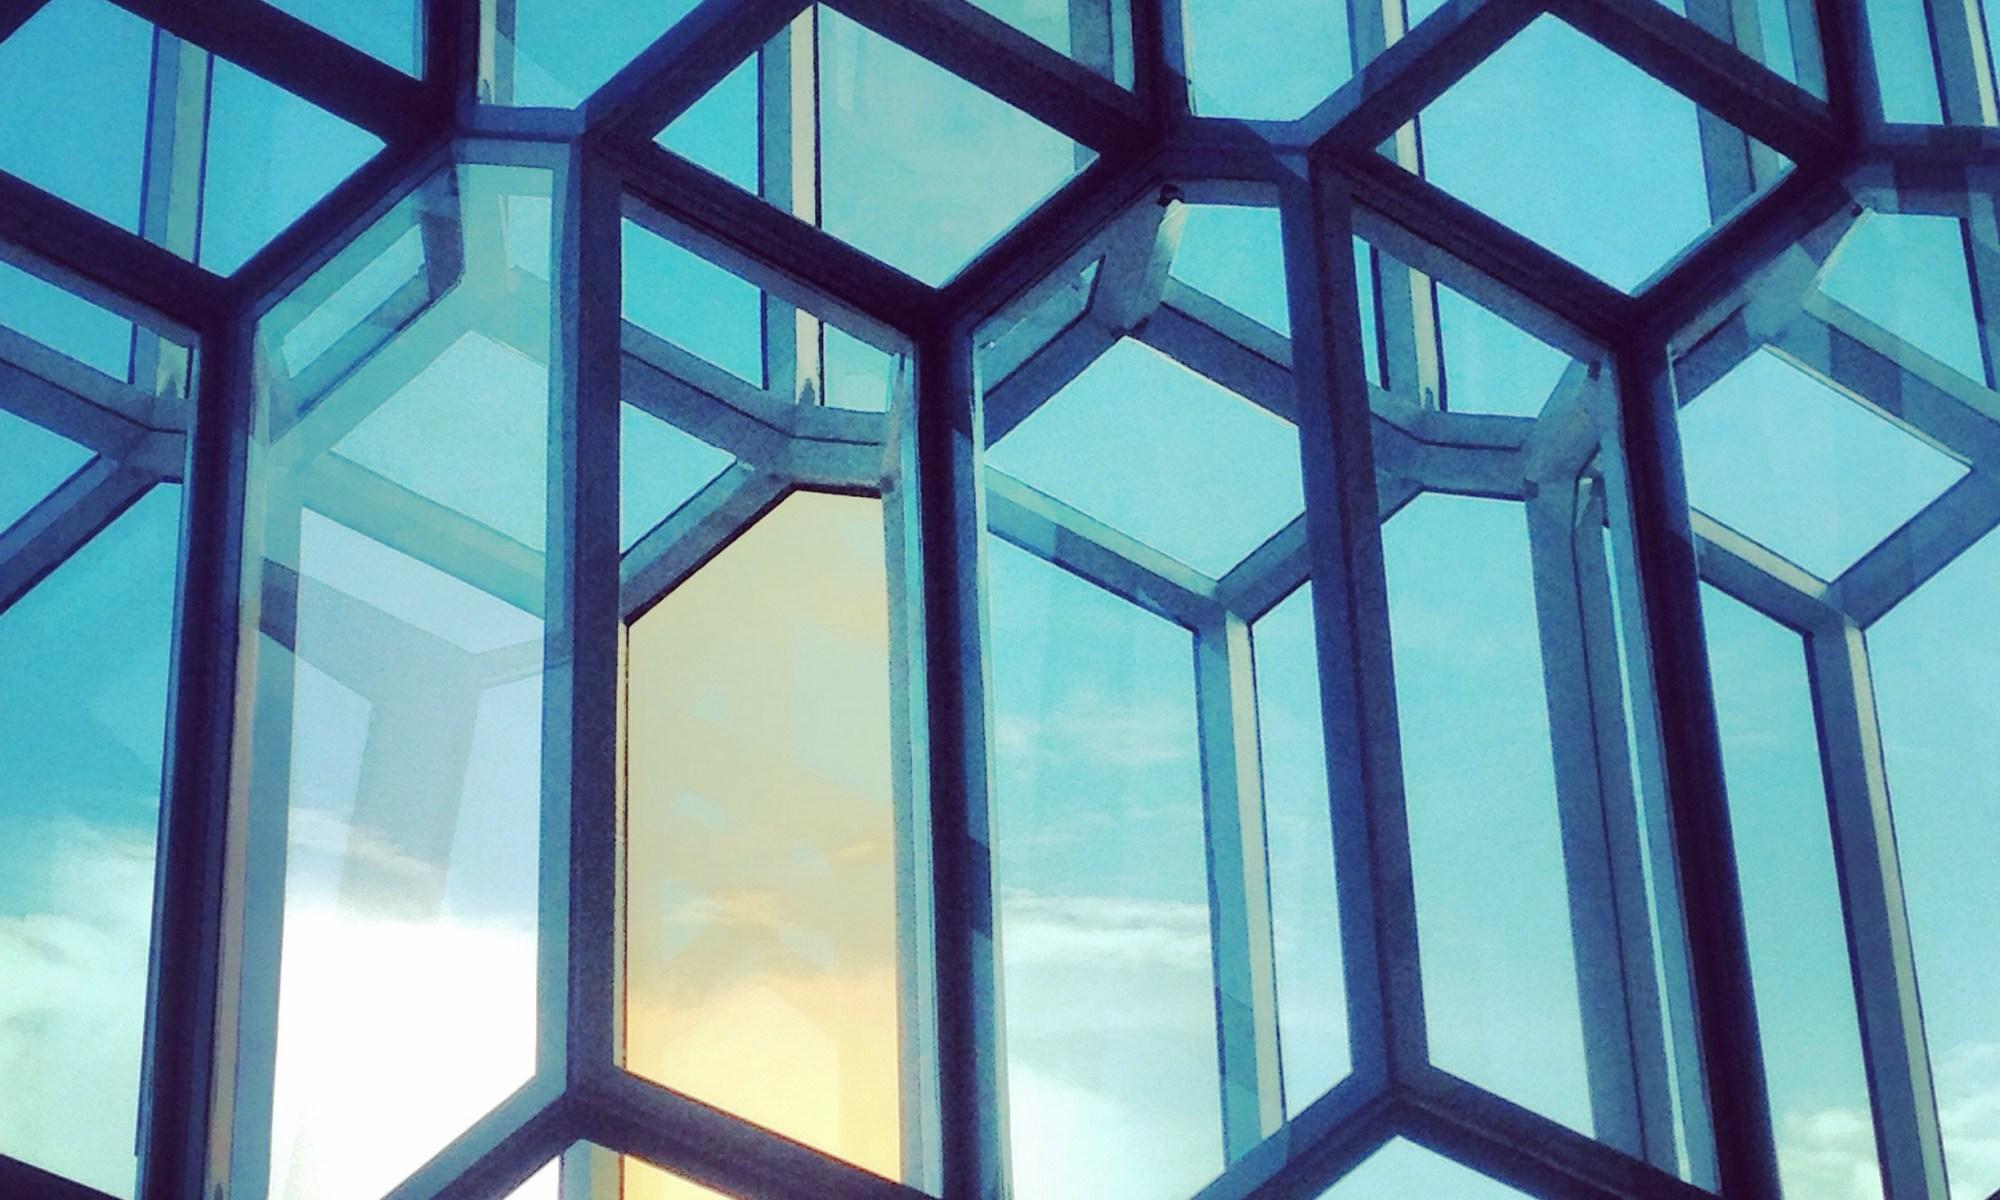 windows of the harpa